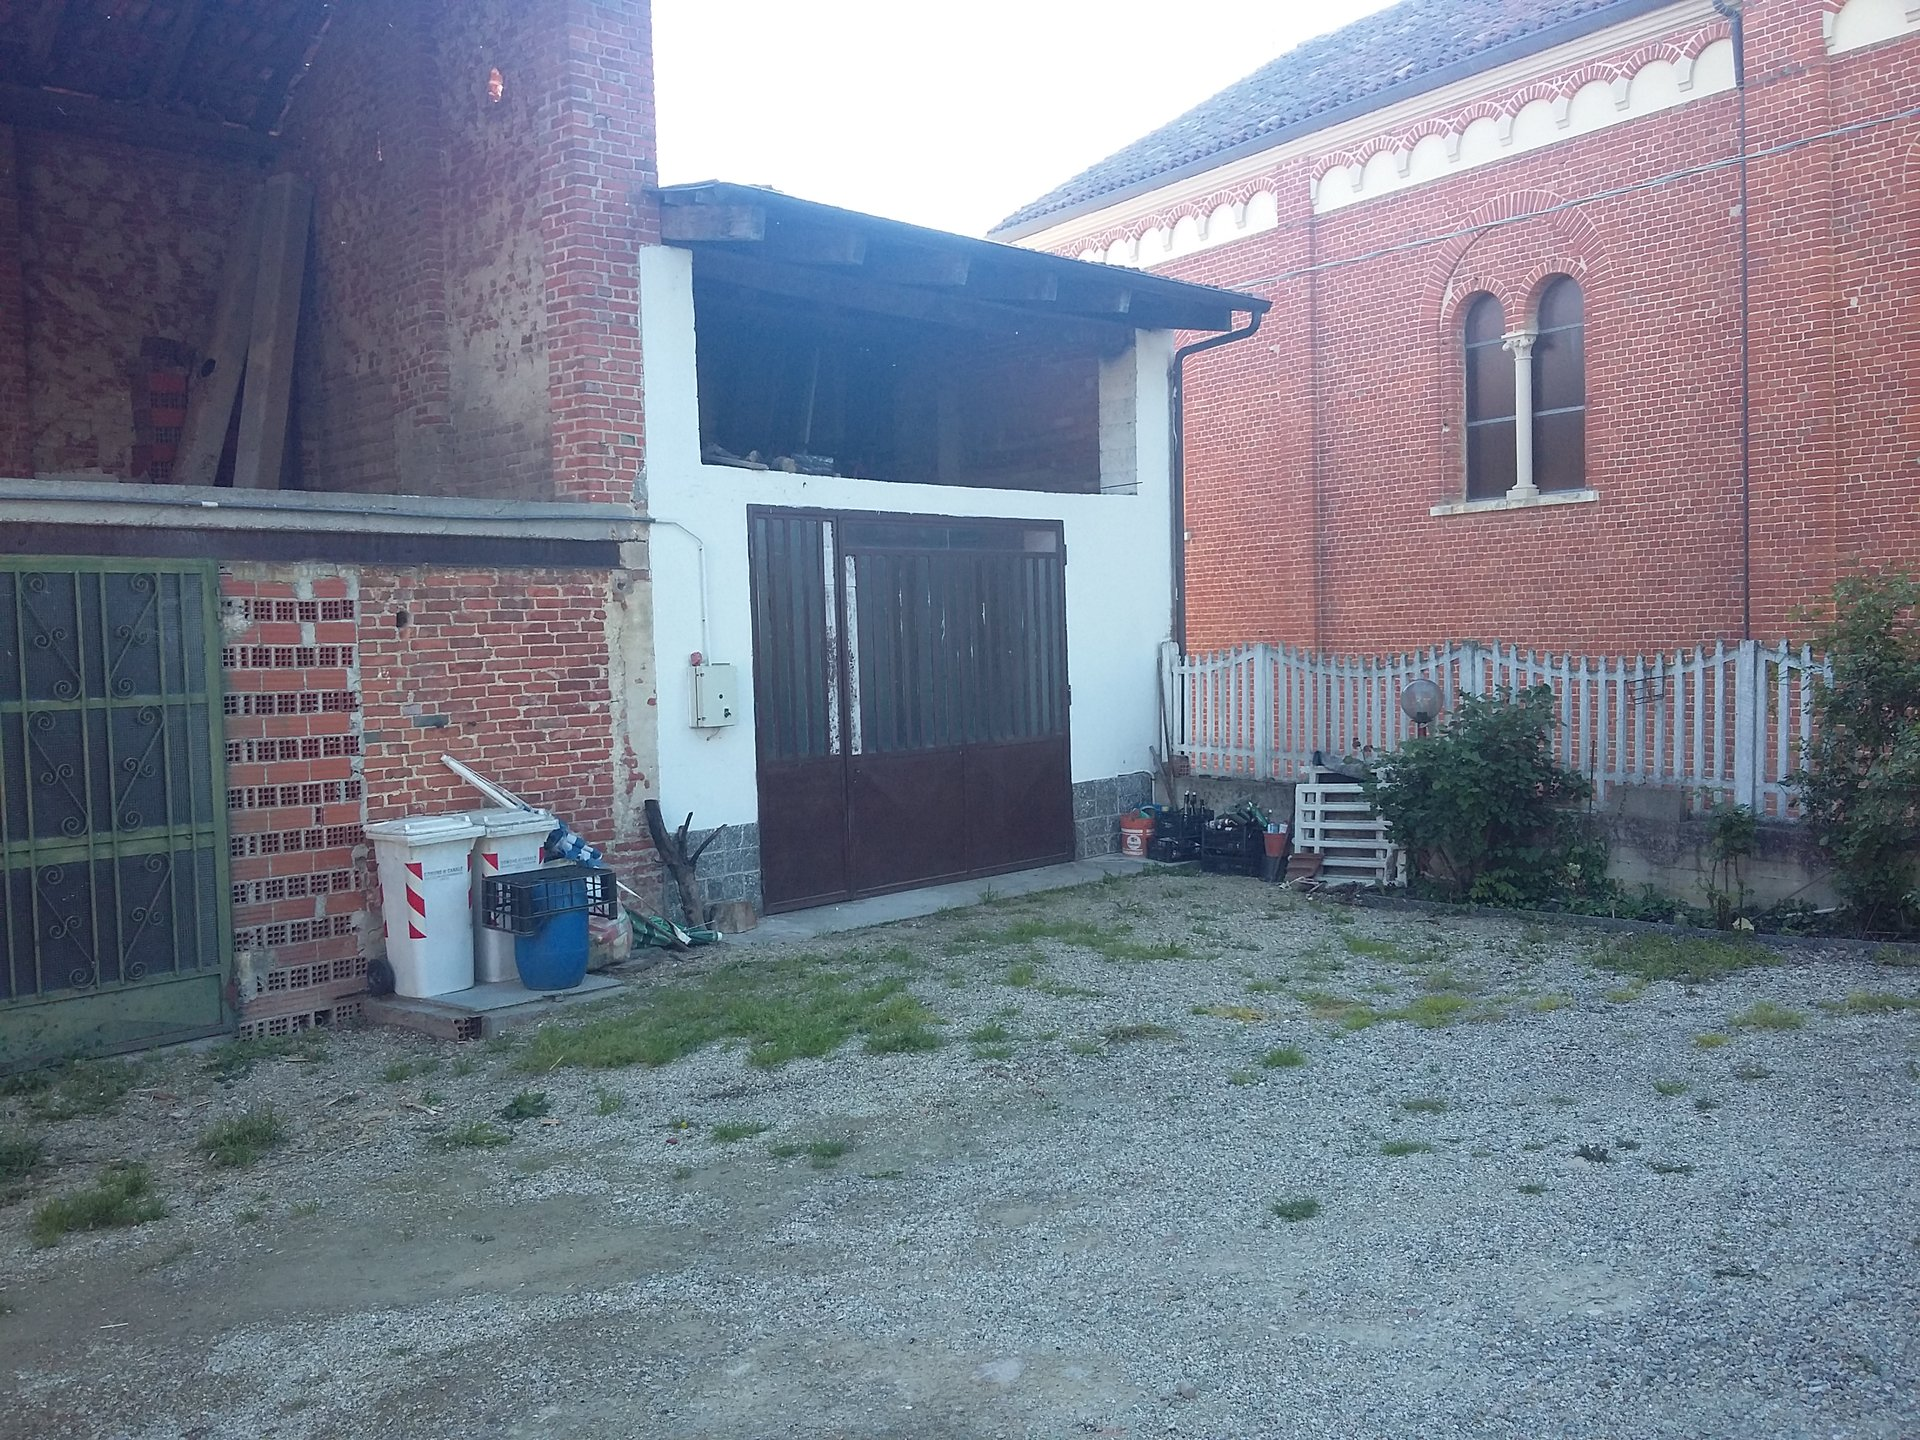 Casa Canale